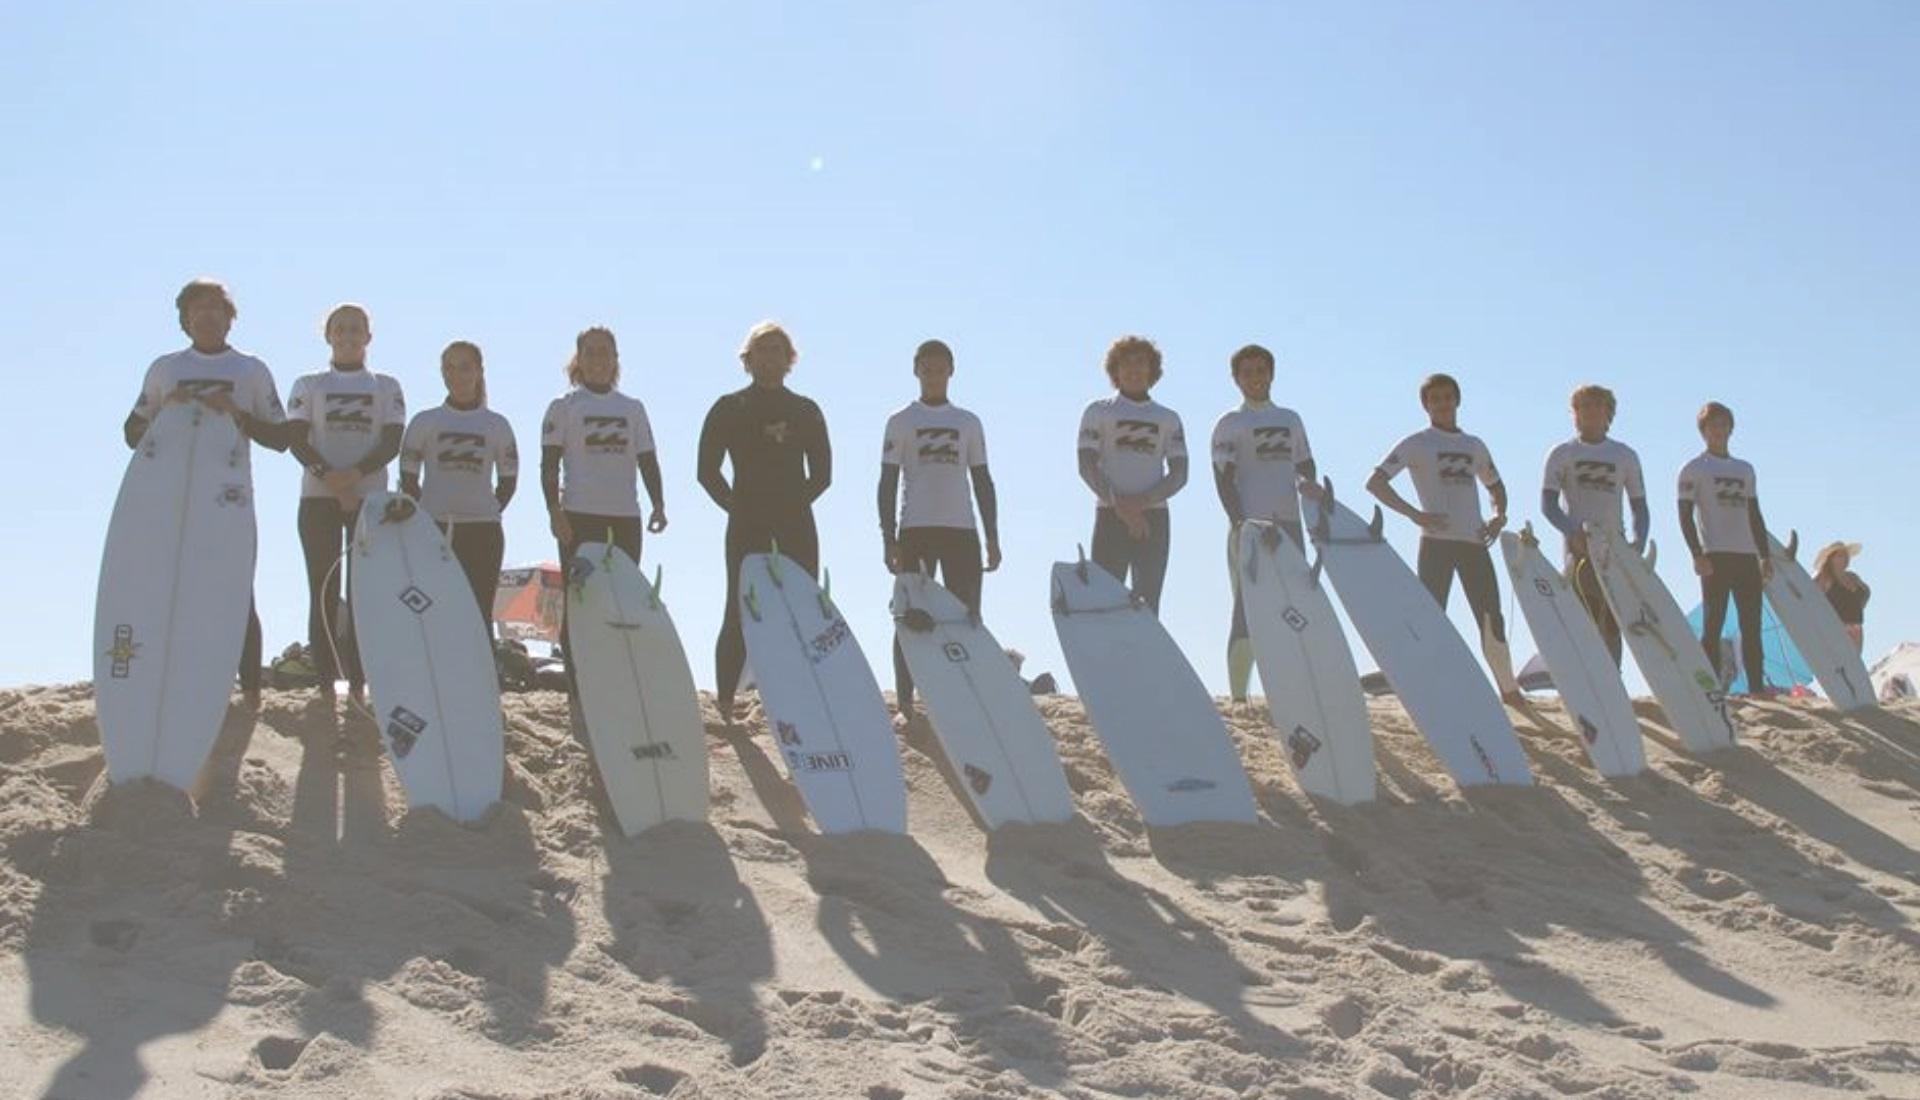 Junte-se à nossa Surf Academy!